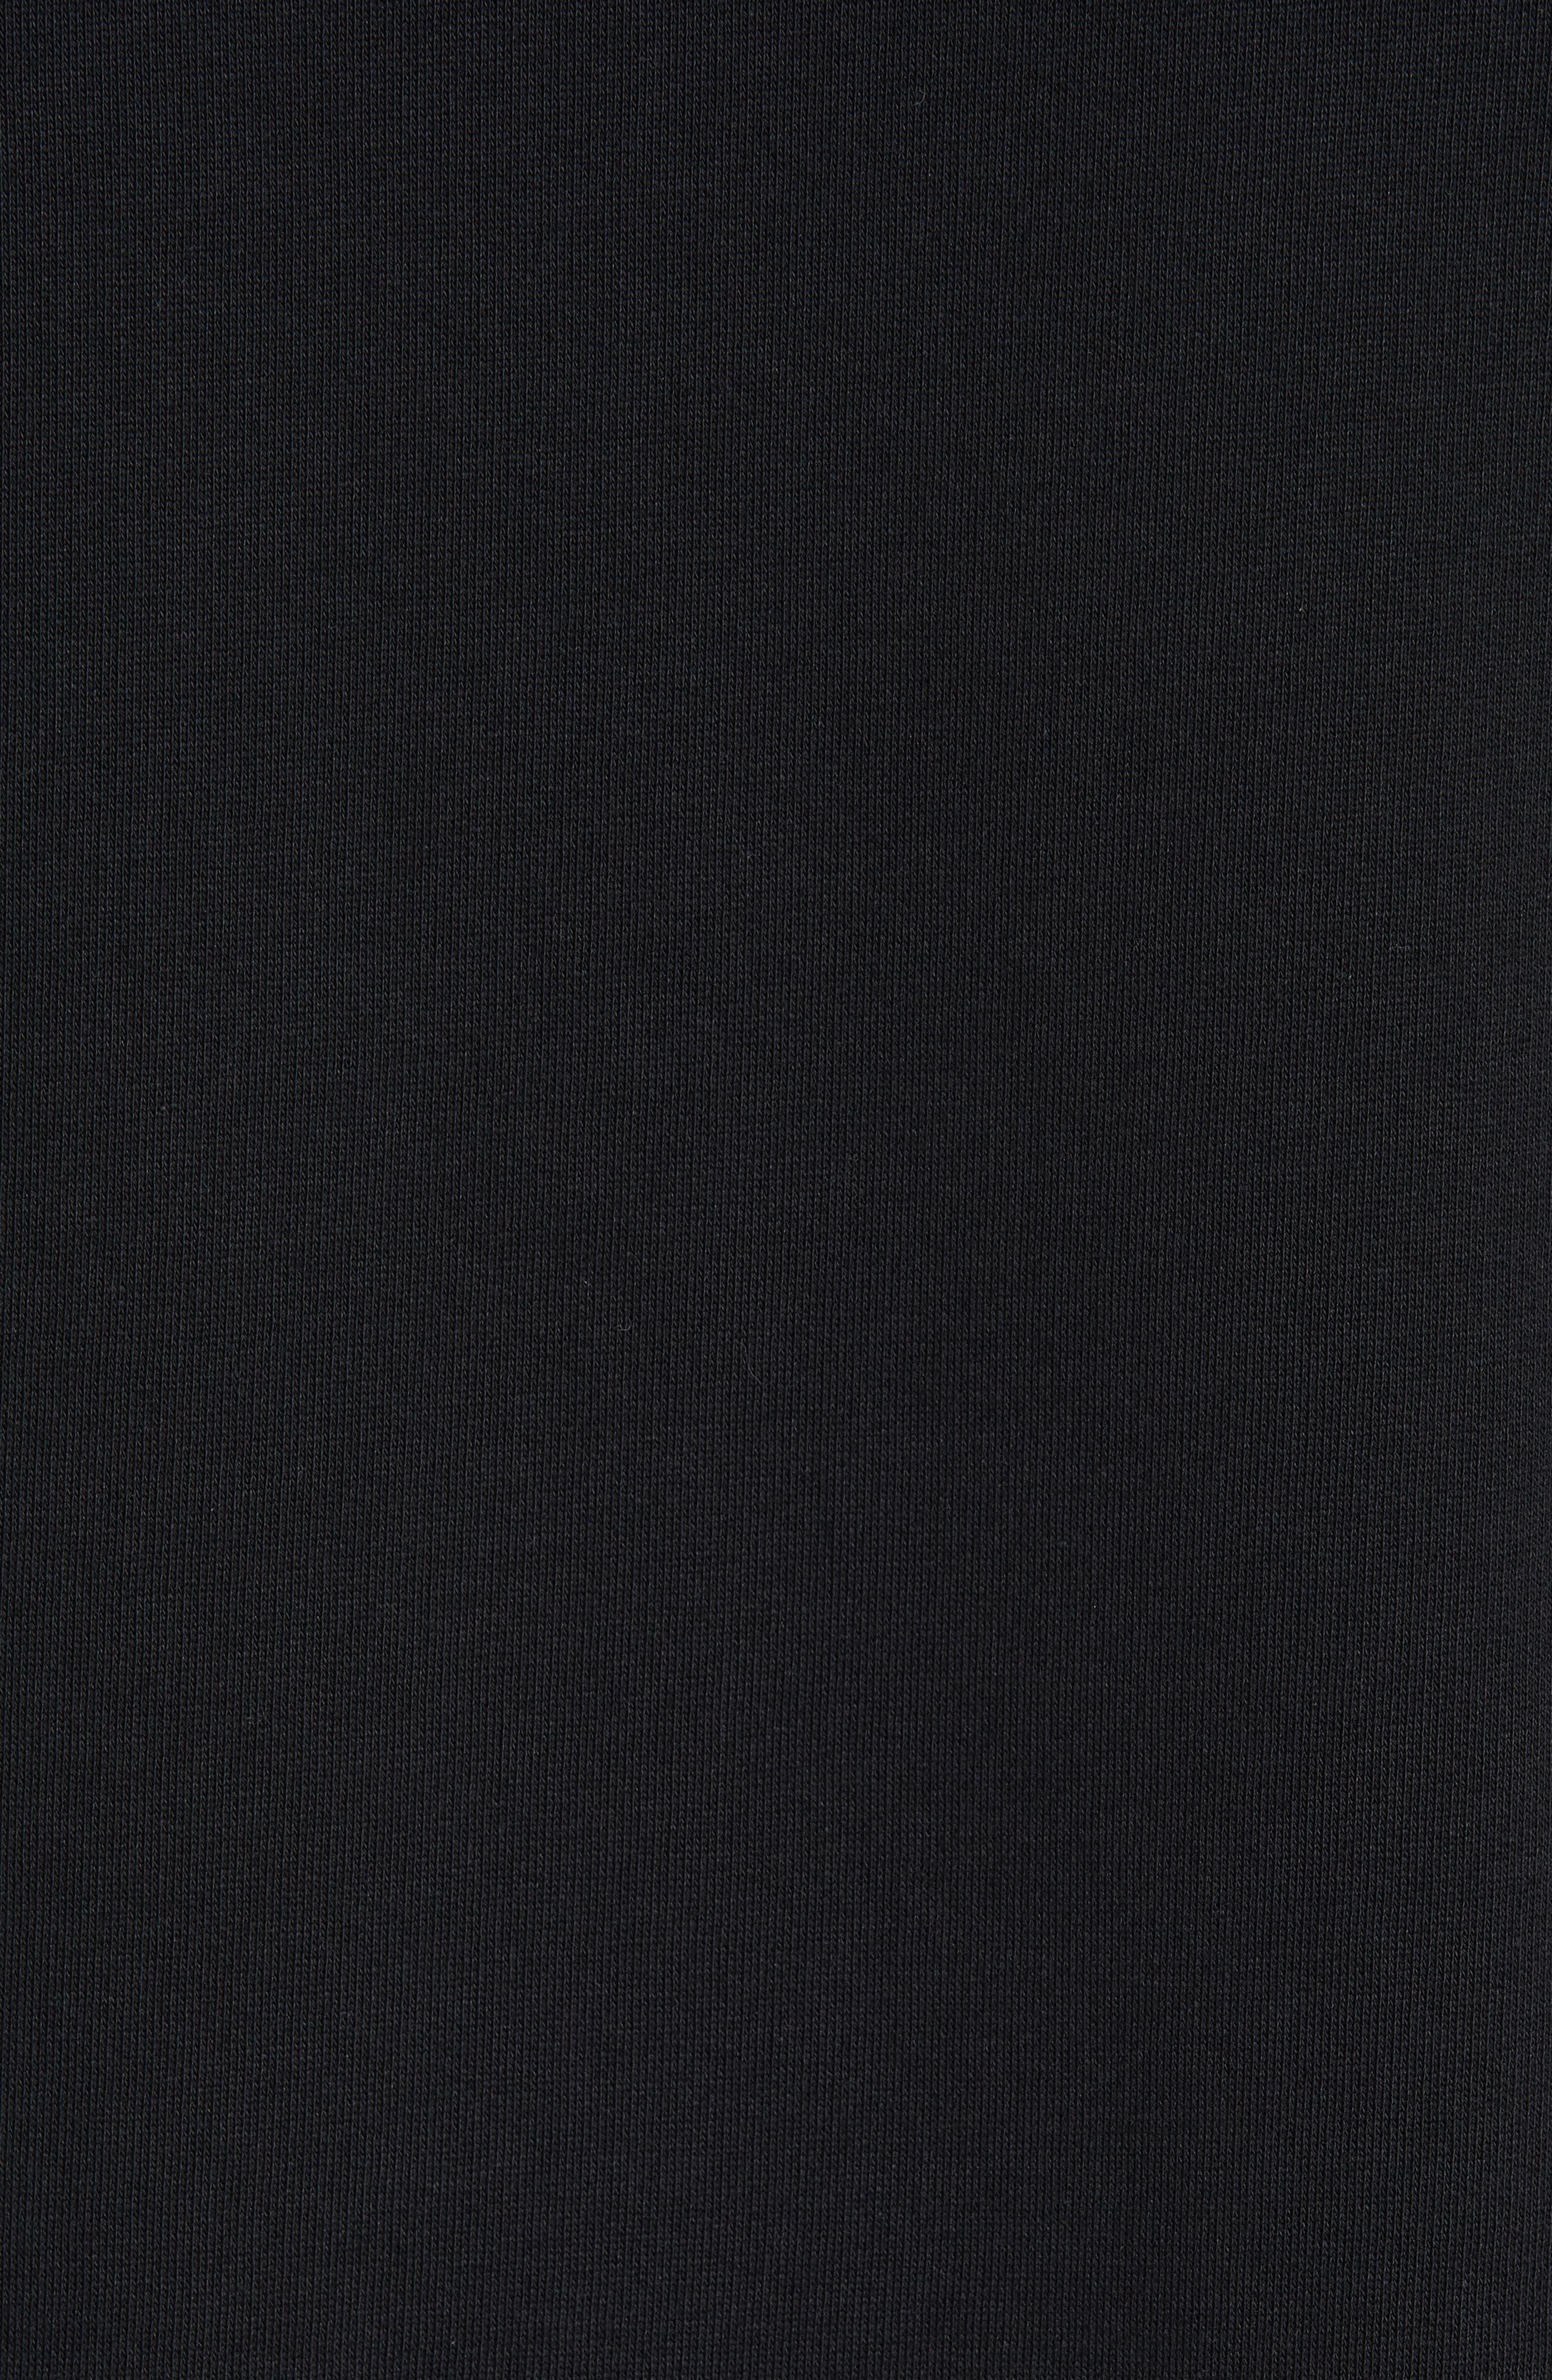 ACNE STUDIOS, Farrin Face Hooded Sweatshirt, Alternate thumbnail 5, color, BLACK